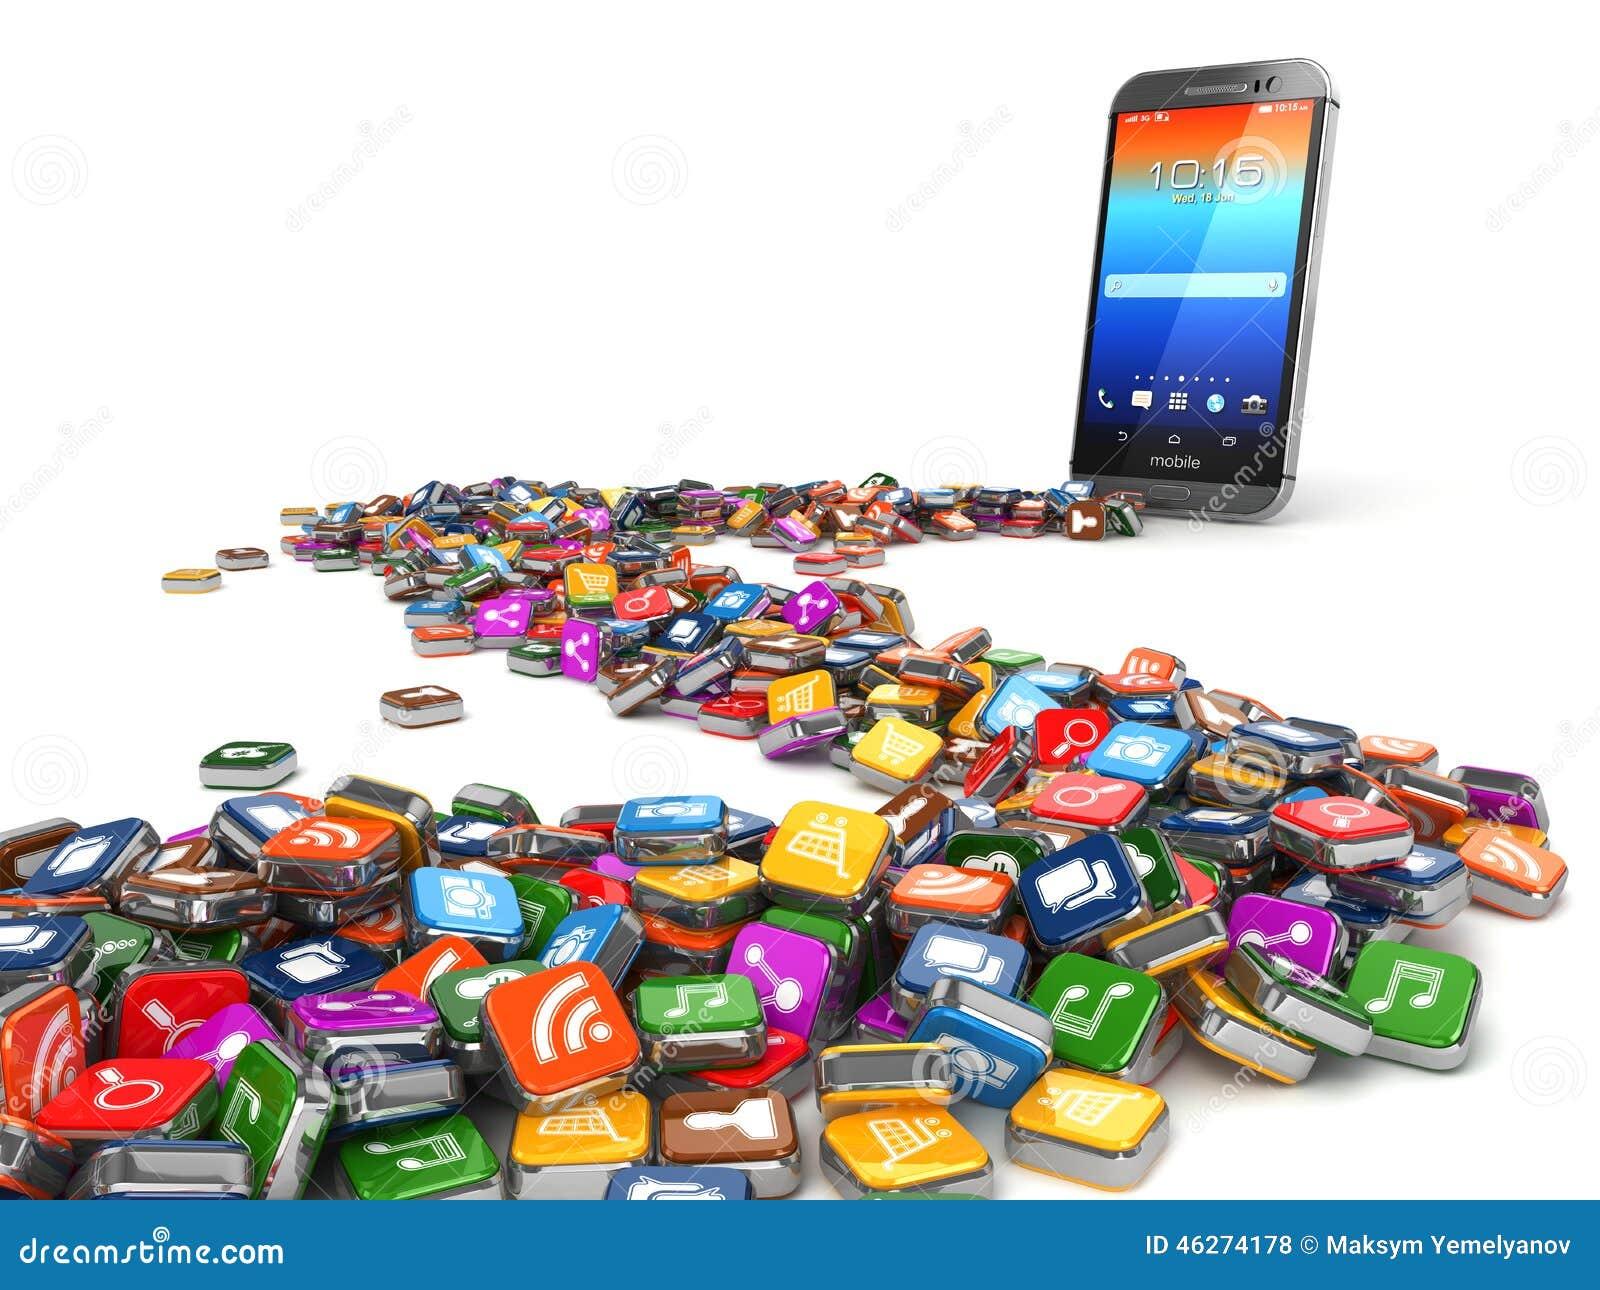 28+ Stock Phone App Wallpapers